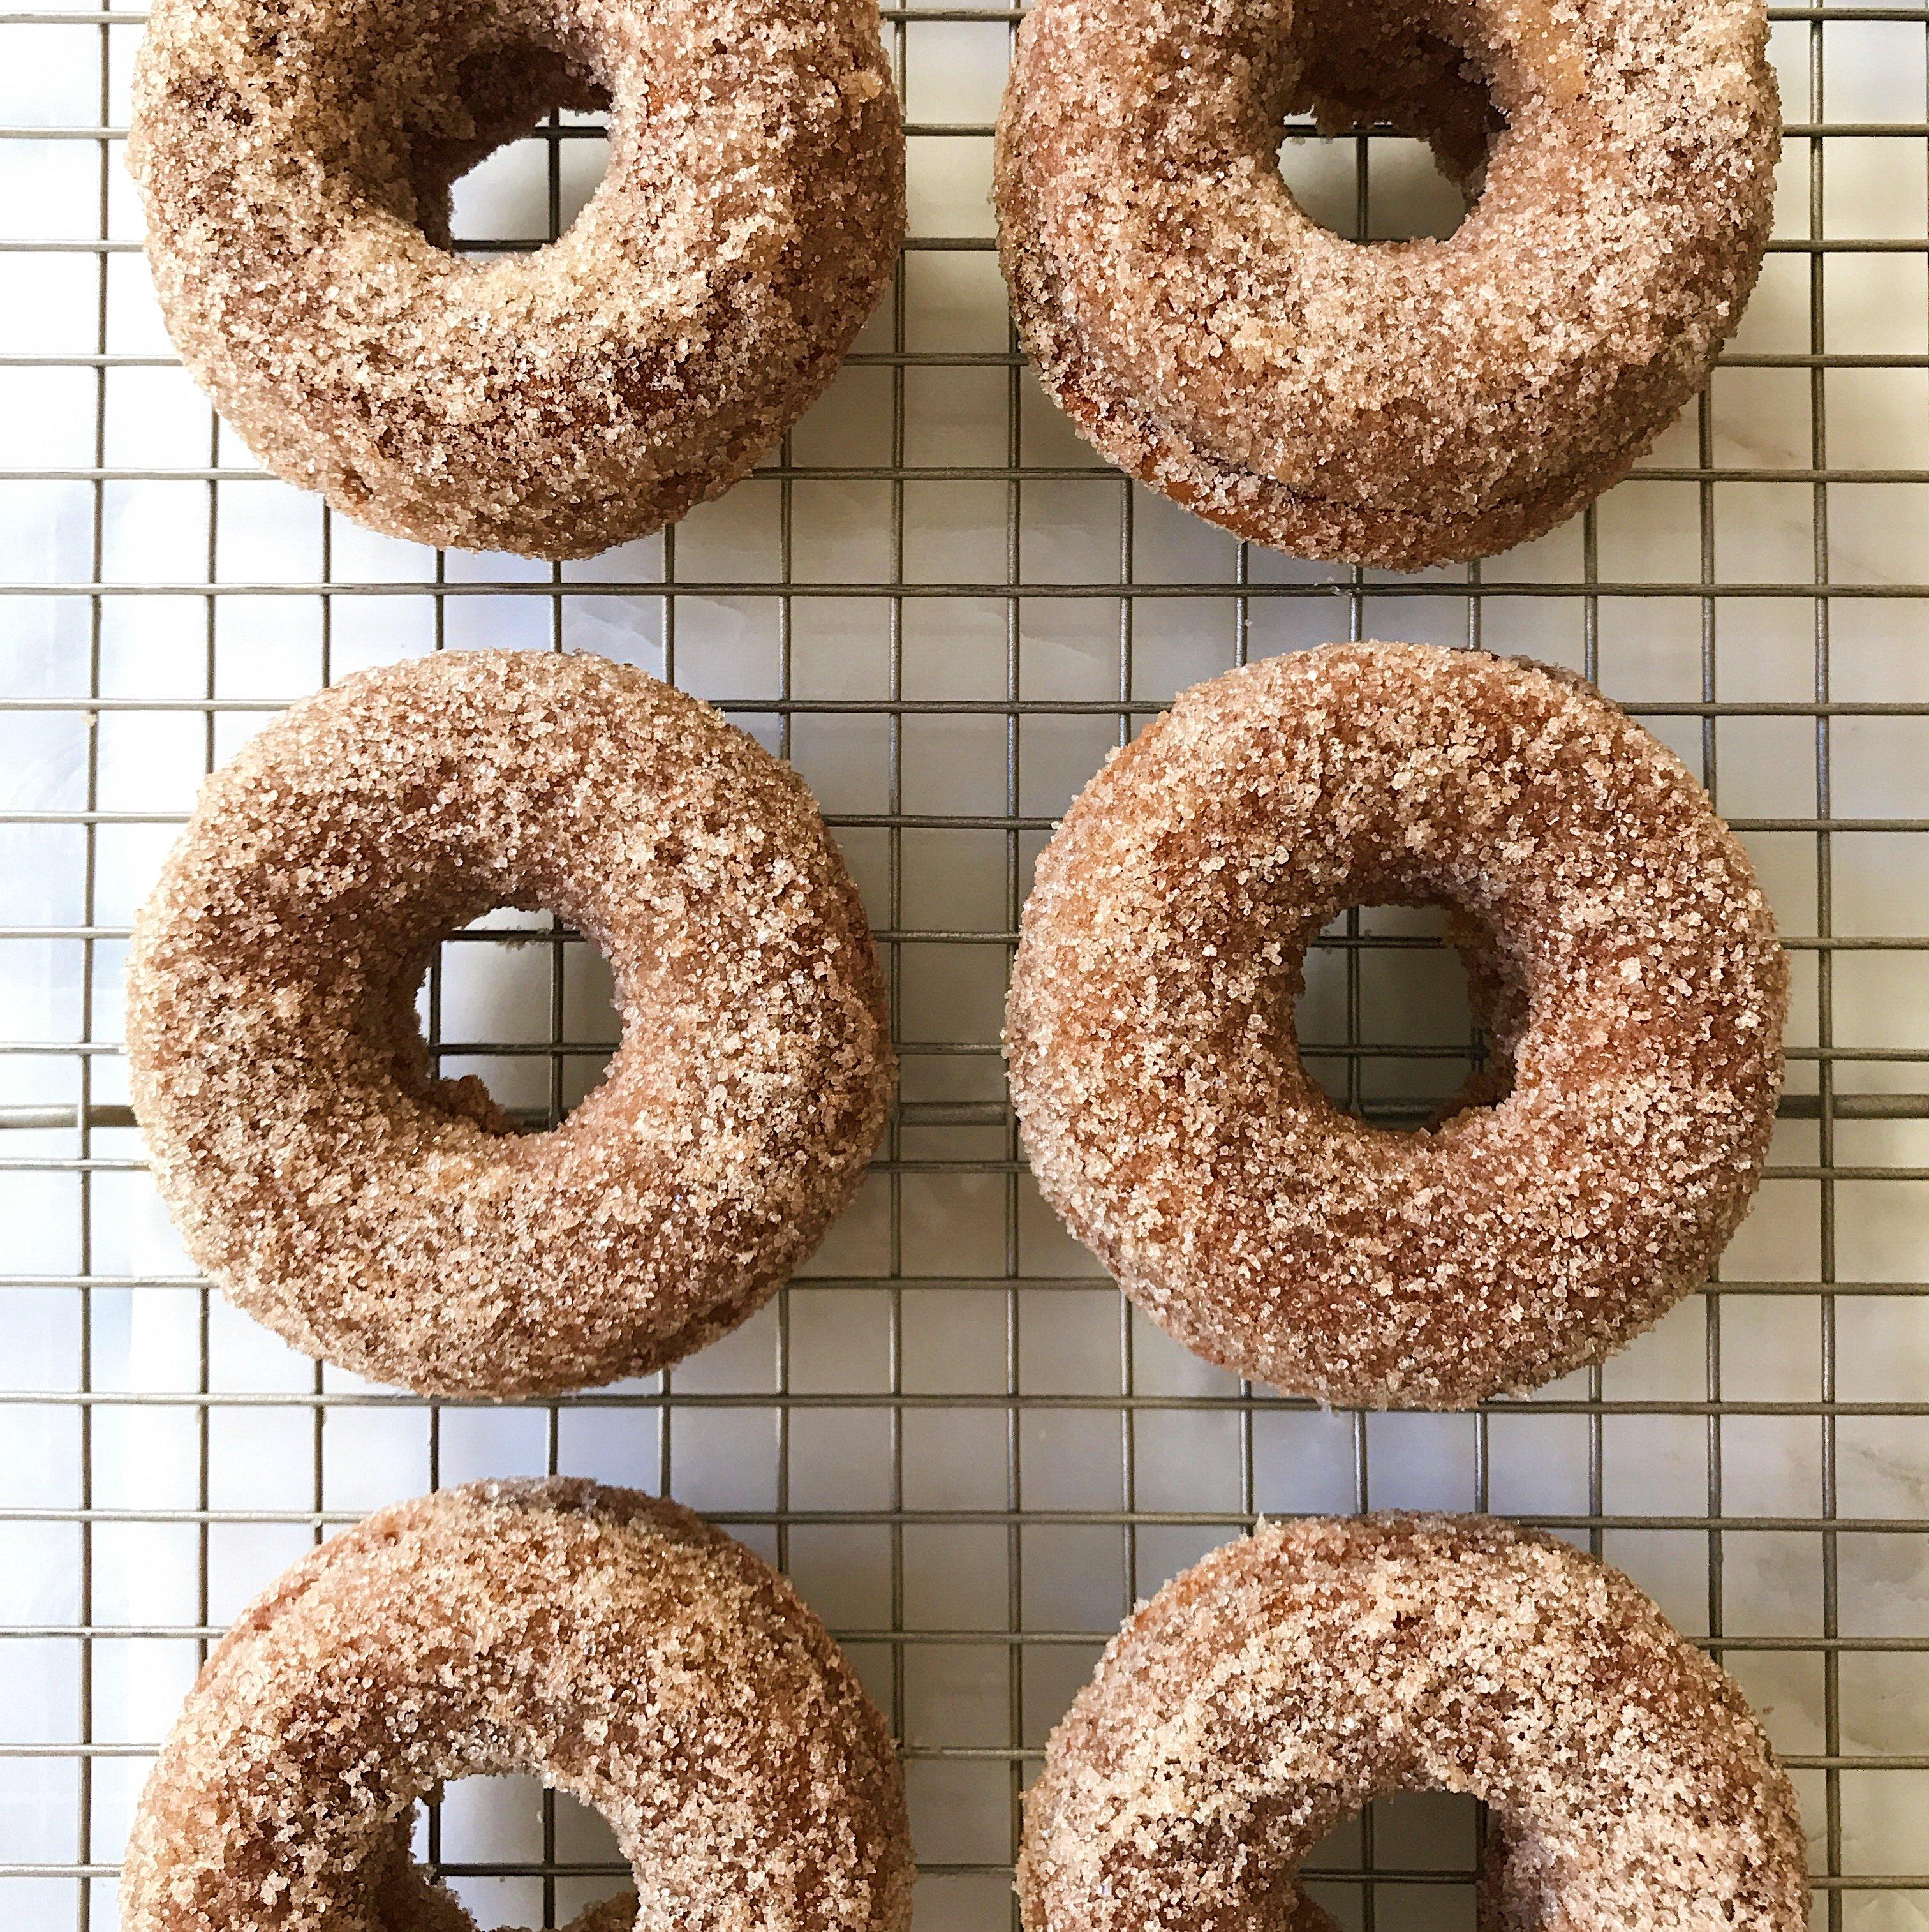 gluten free baked pumpkin donuts #glutenfree #glutenfreerecipes www.healthygffamily.com